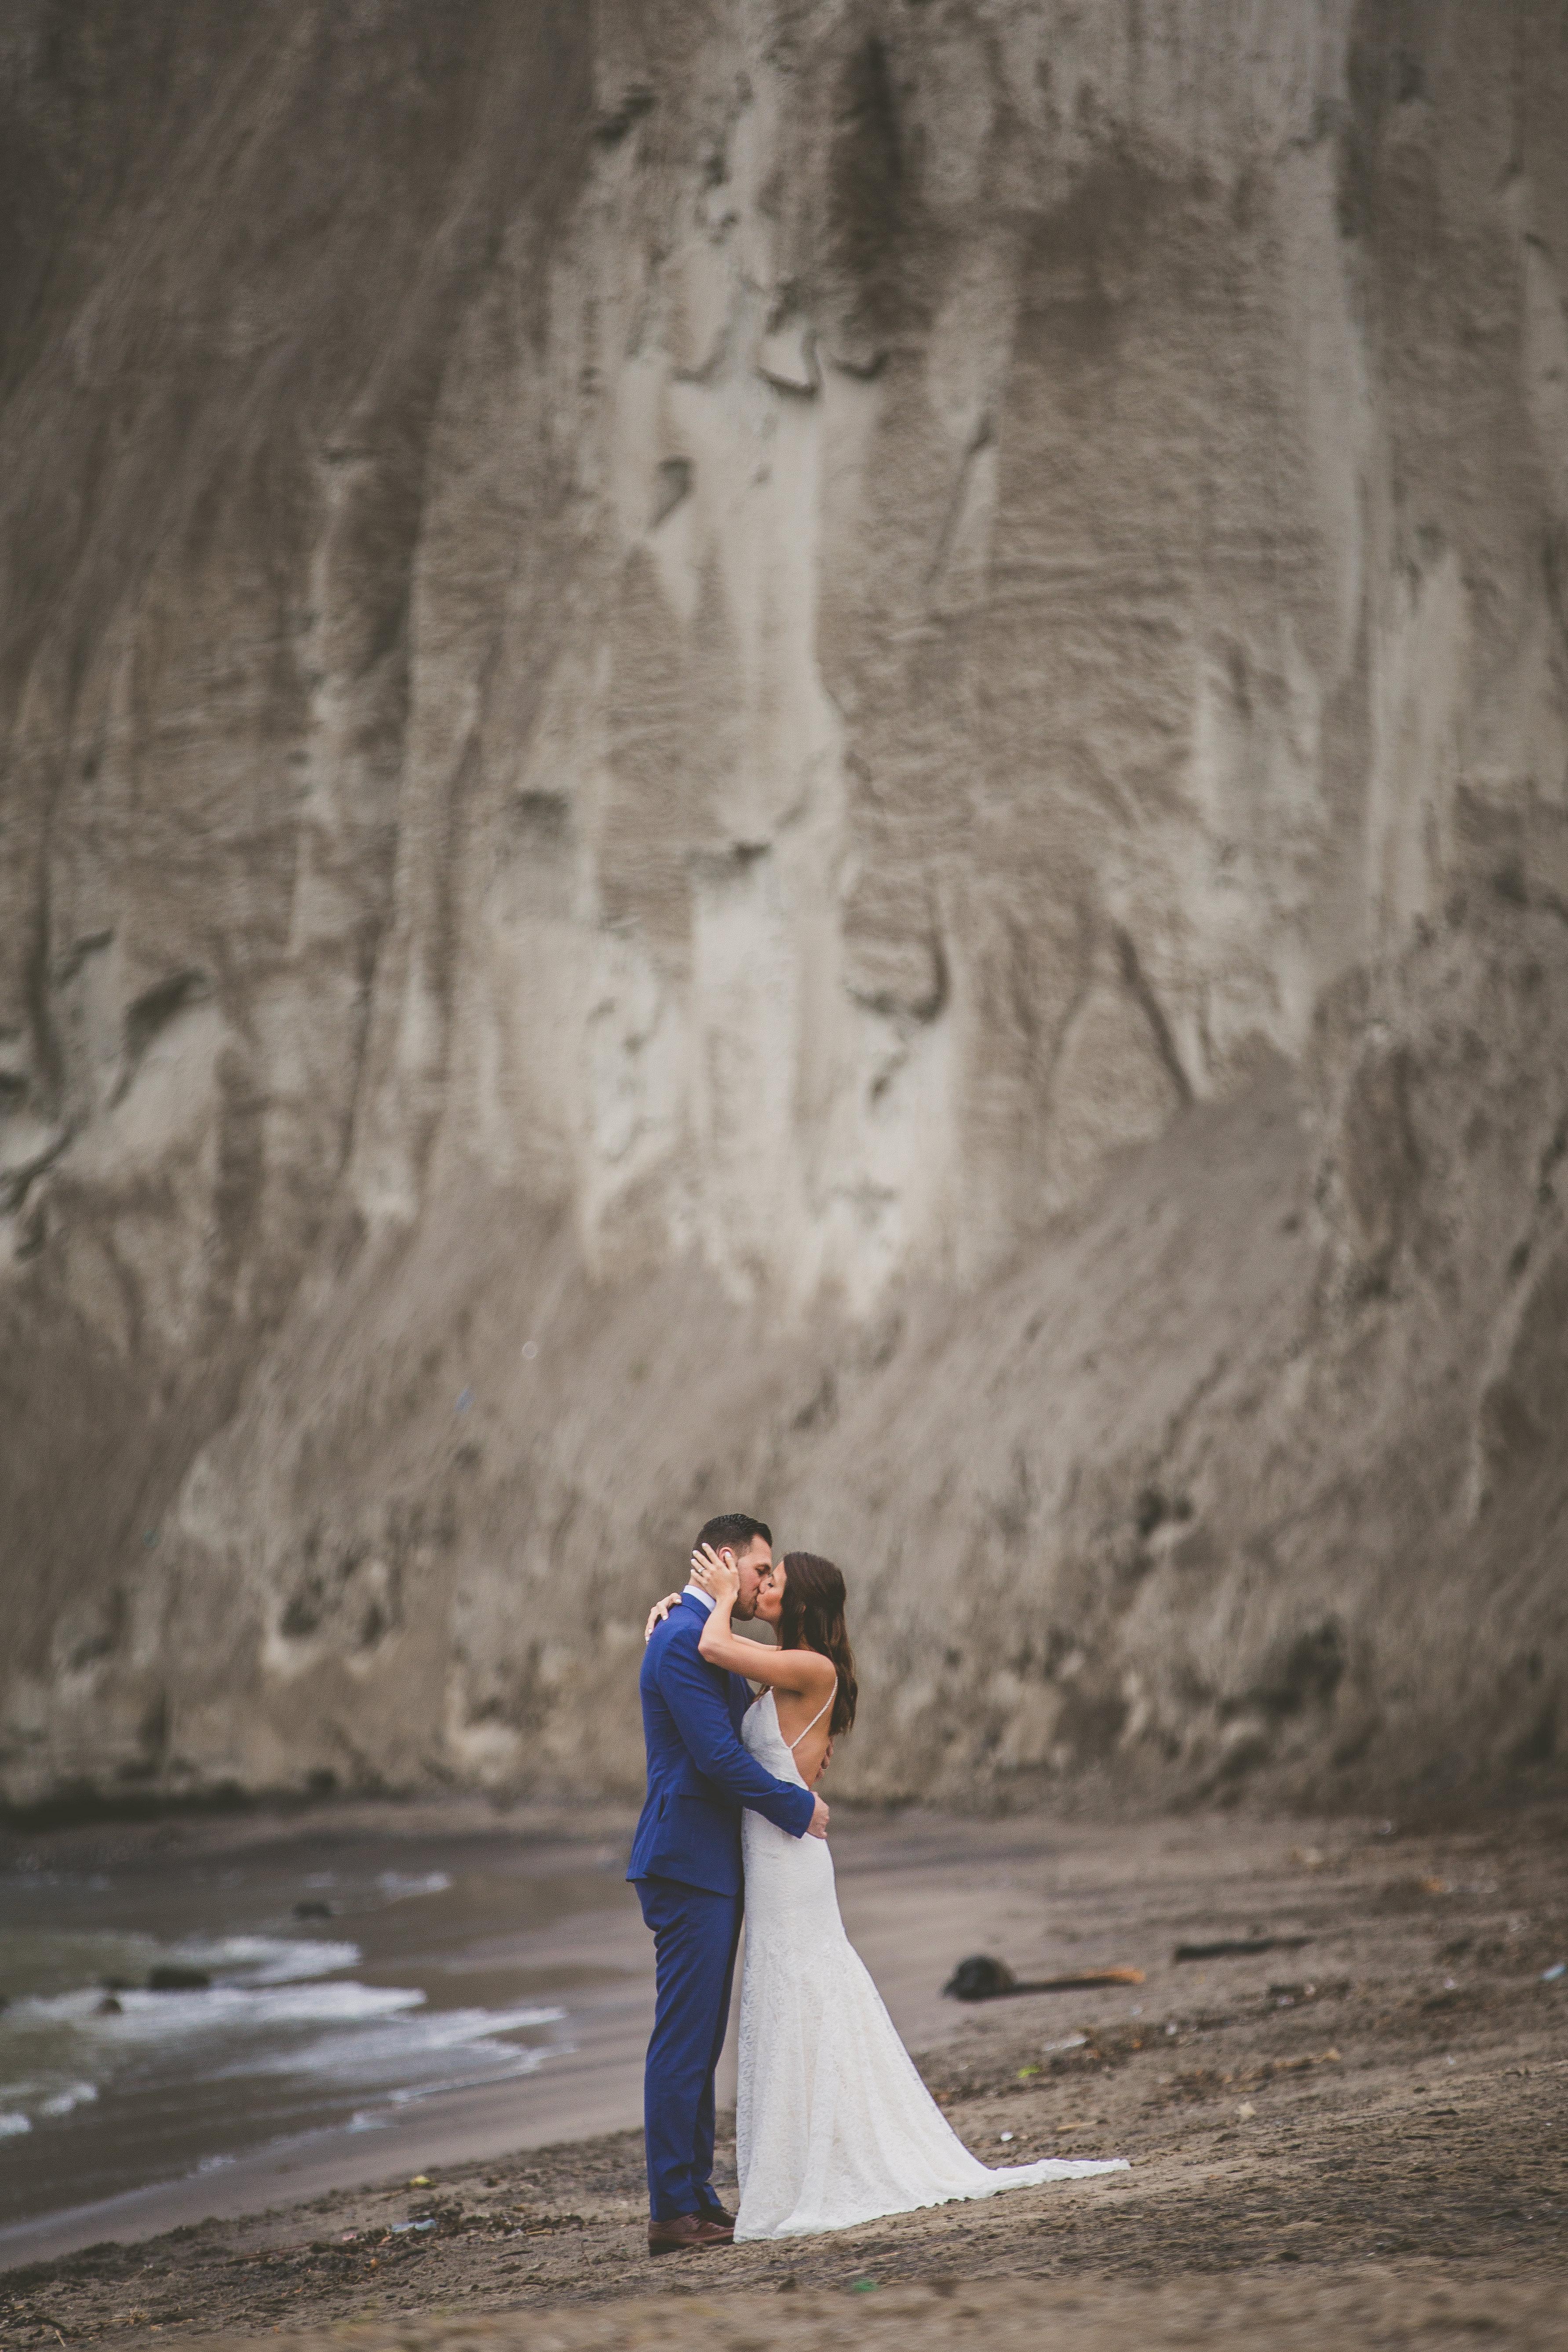 scarborough bluffs wedding photos 48 - Scarborough Bluffs Wedding Photos